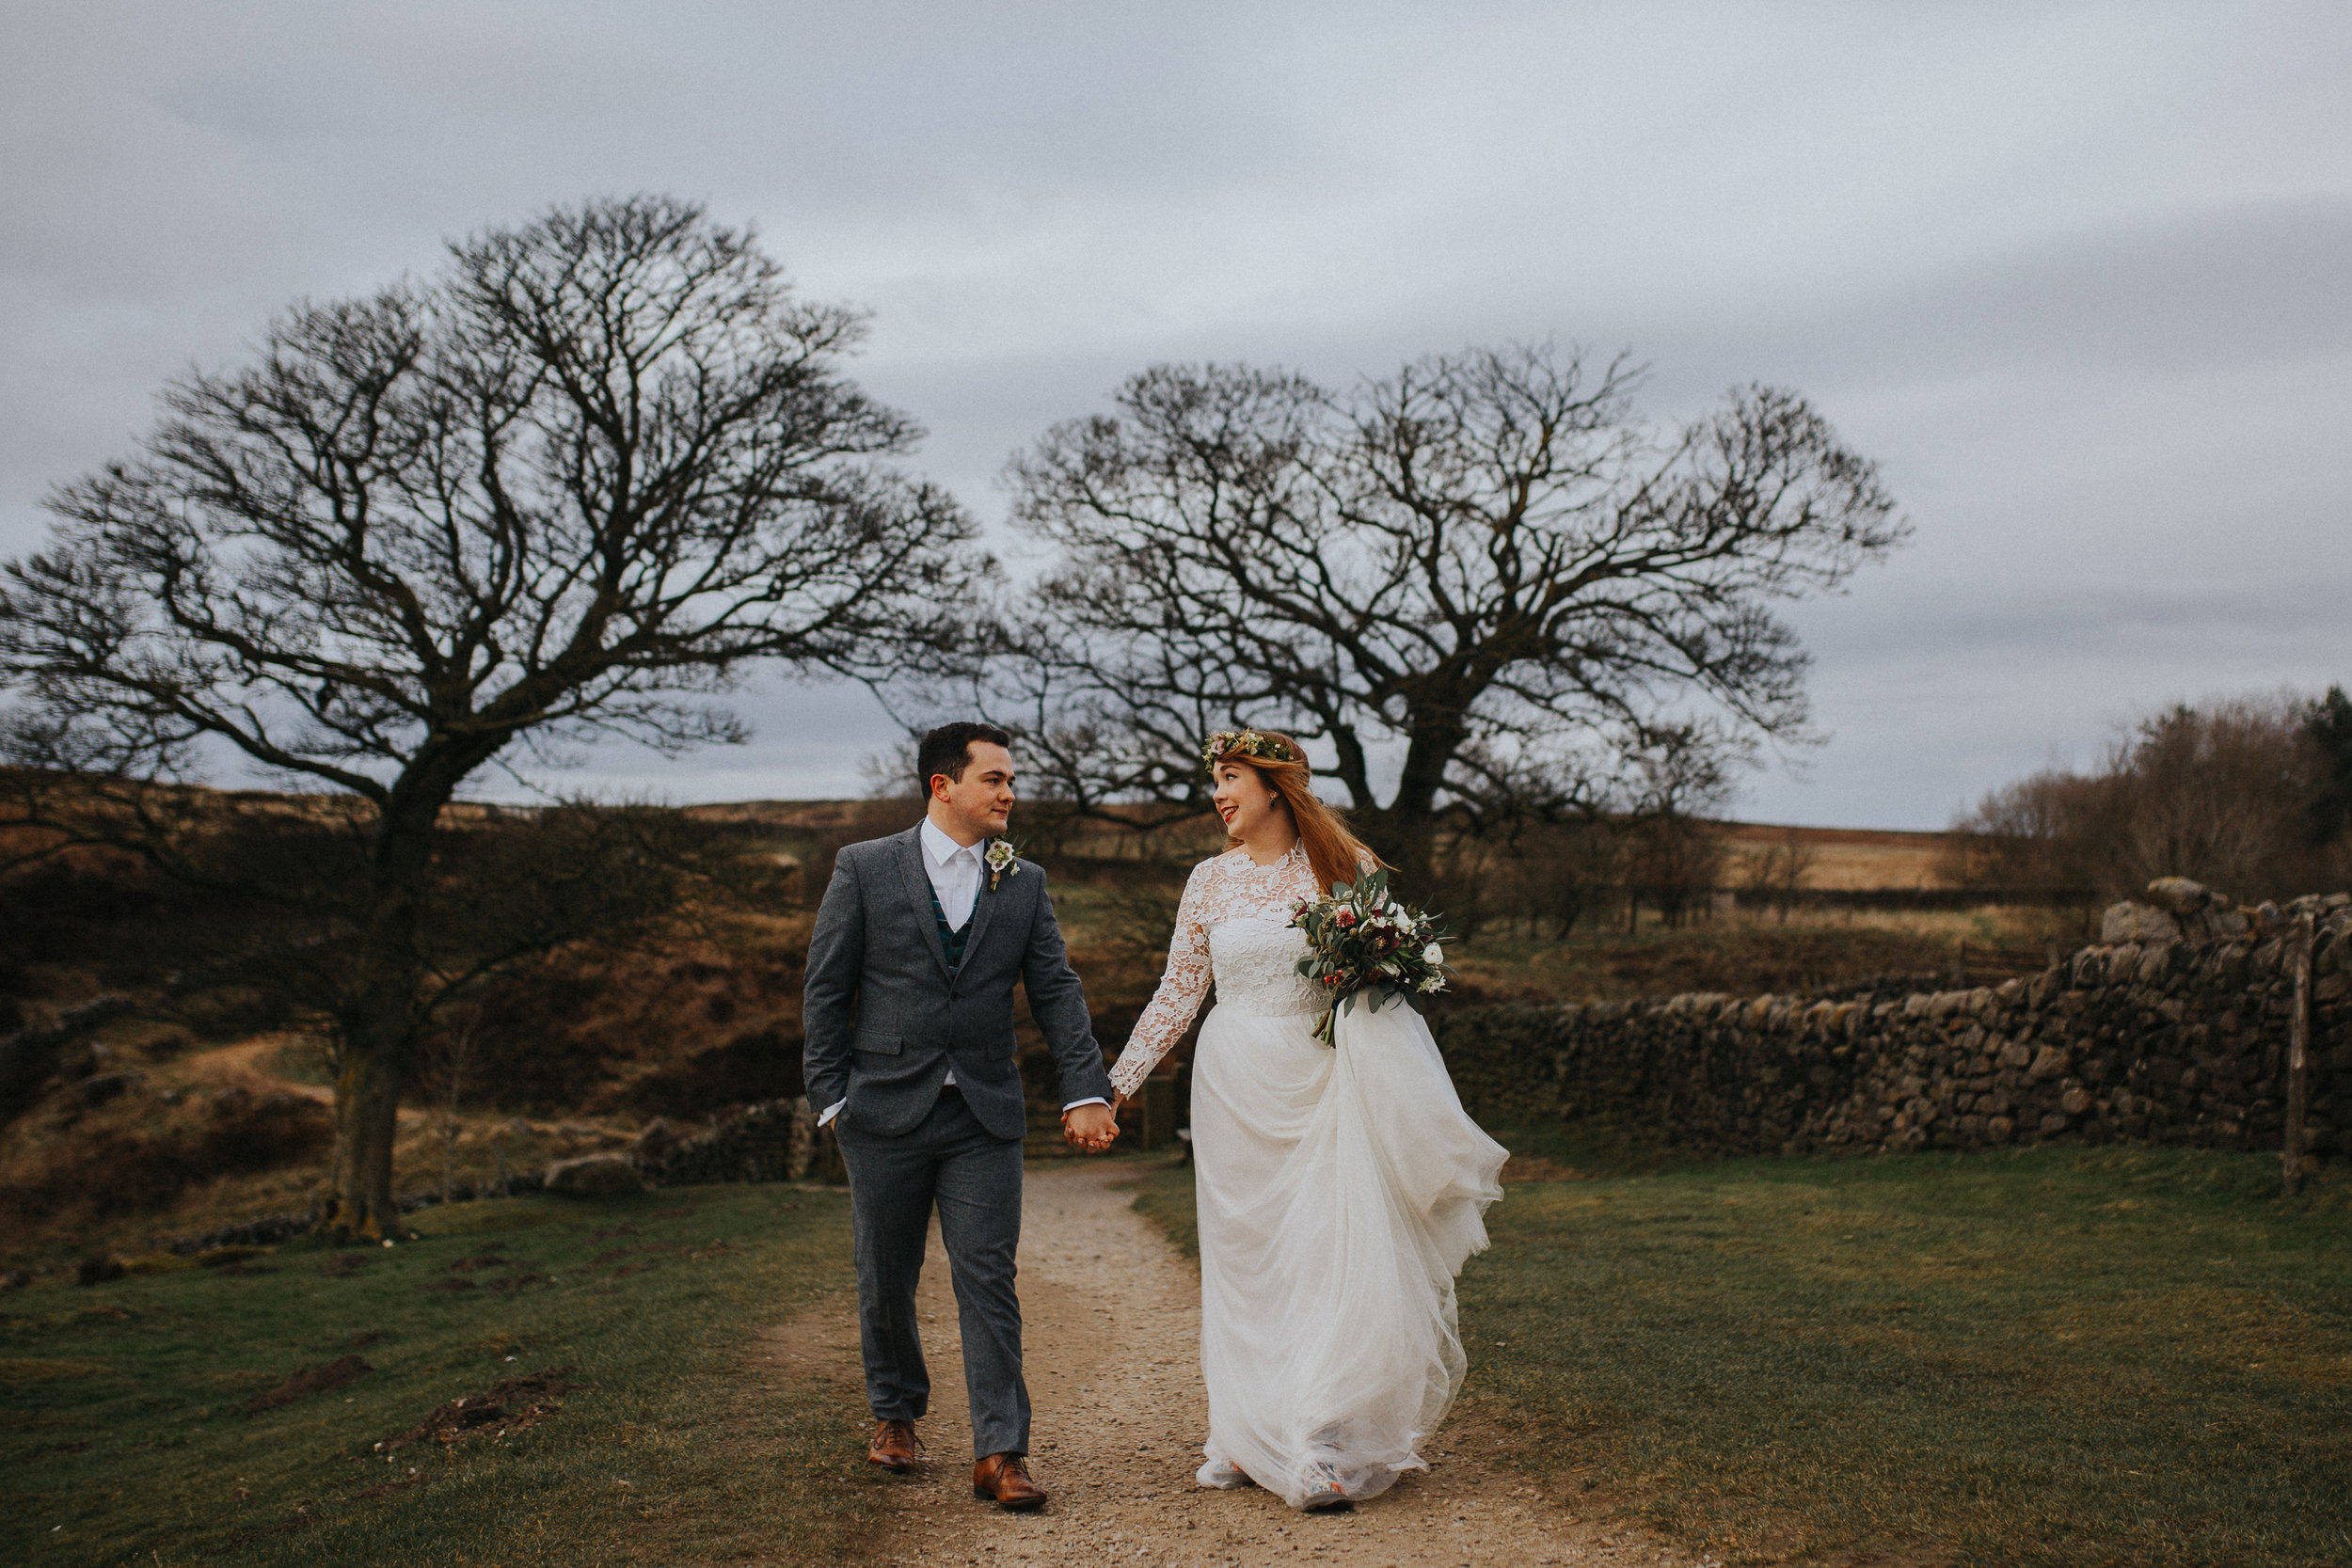 Rosie-bespoke-lace-long sleeved-tulle-wedding-dress-winter-peak district-susanna greening-3.jpg